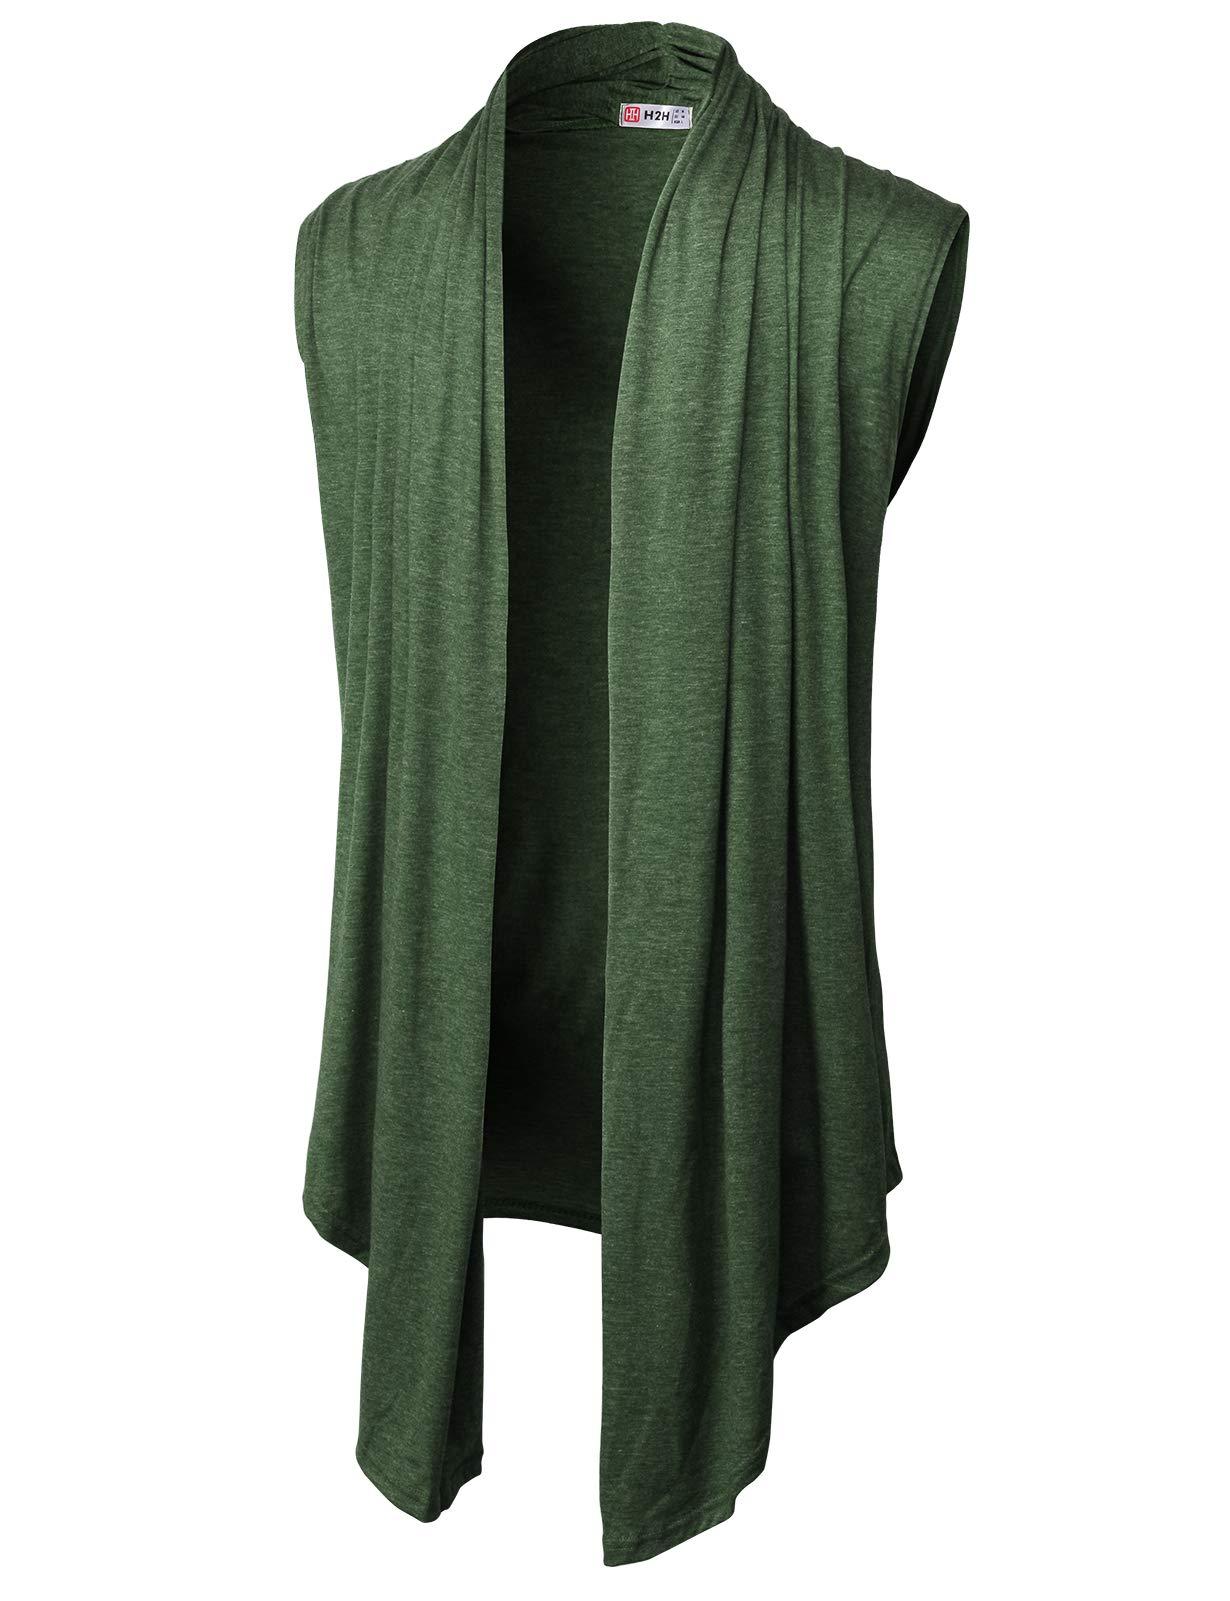 H2H Men's Ruffle Shawl Collar Sleeveless Cardigan Lightweight Cotton Long Length Drape Cape Vest DARKOLIVE US M/Asia L (CMOCASL01)